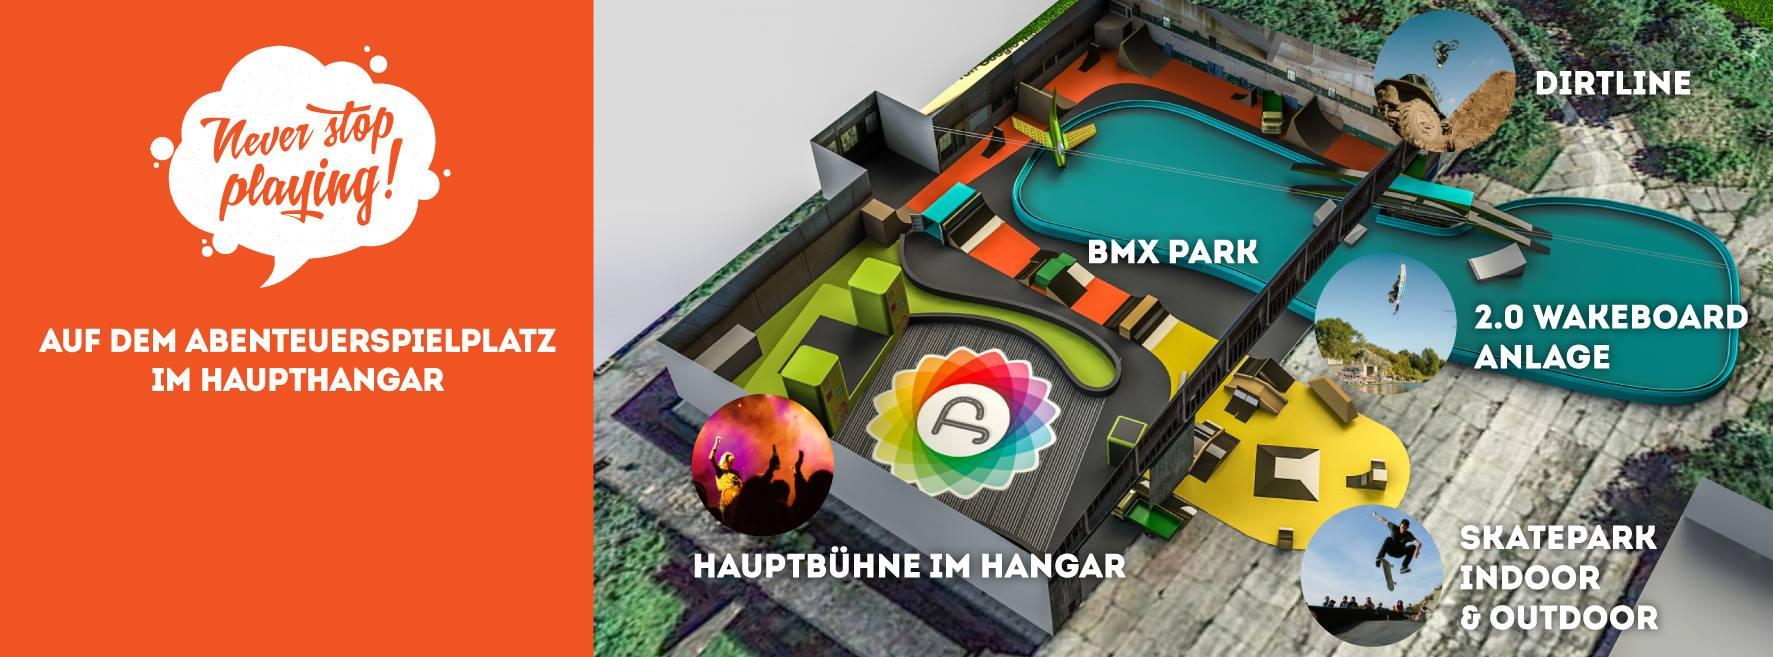 28 8 Pangea Festival 2014